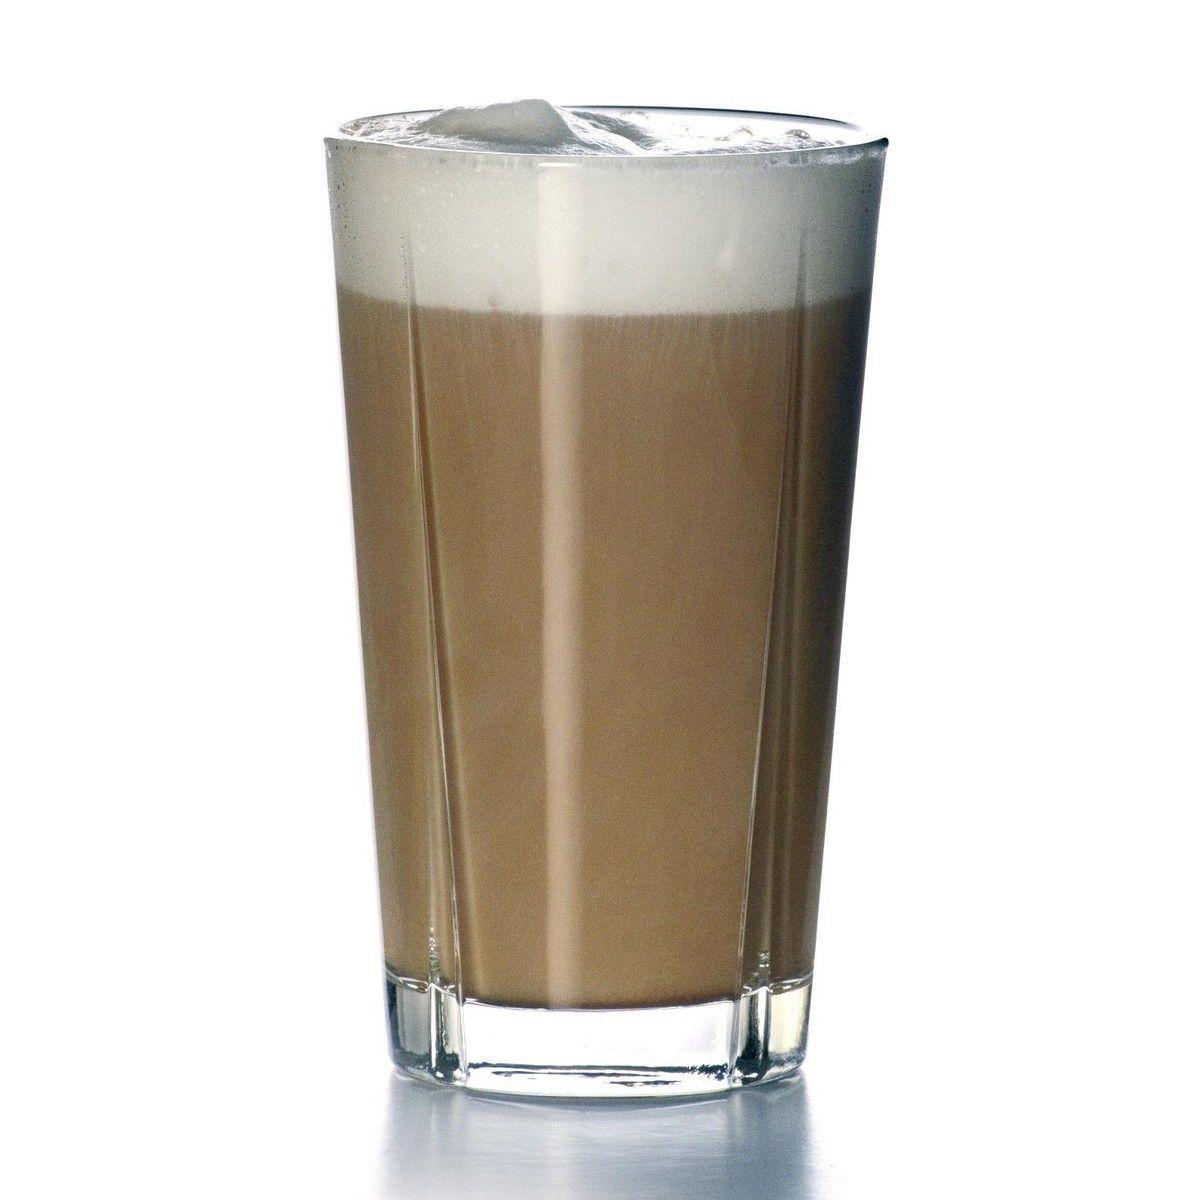 grand cru latte macchiato glass set 4 pieces rosendahl. Black Bedroom Furniture Sets. Home Design Ideas